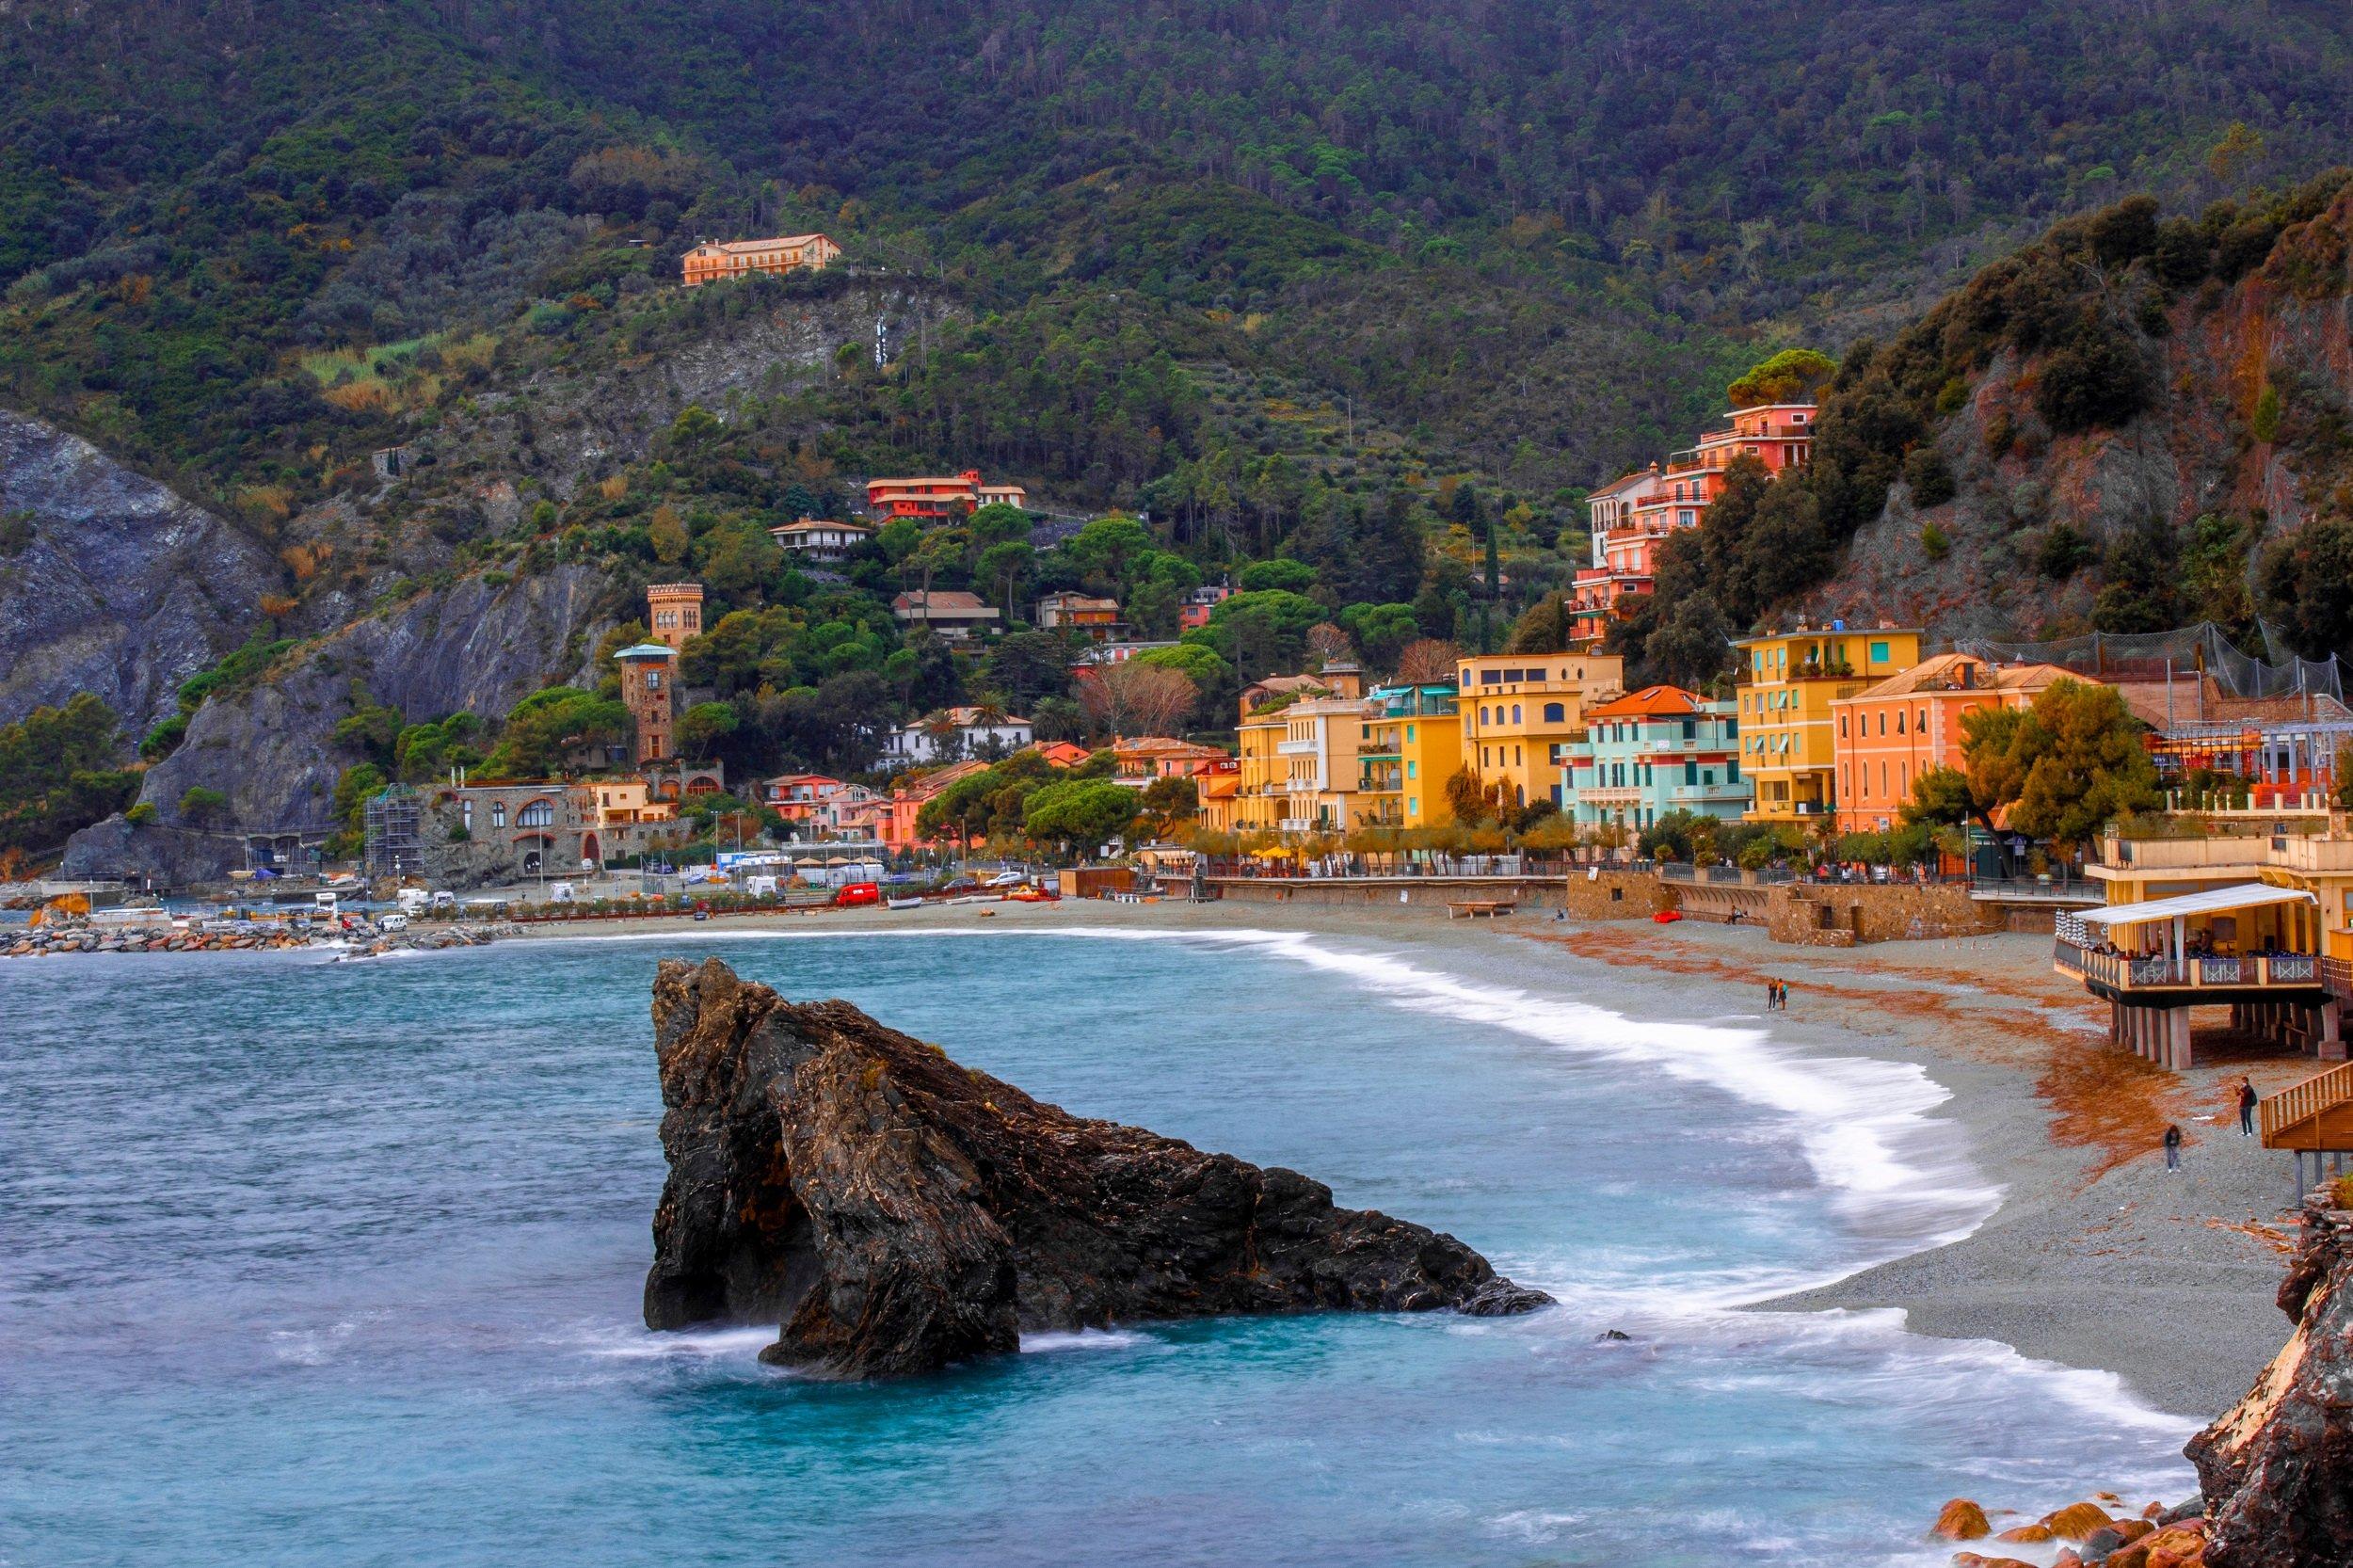 Cinque Terre Sunset Kayak Tour & Aperitif From Monterosso